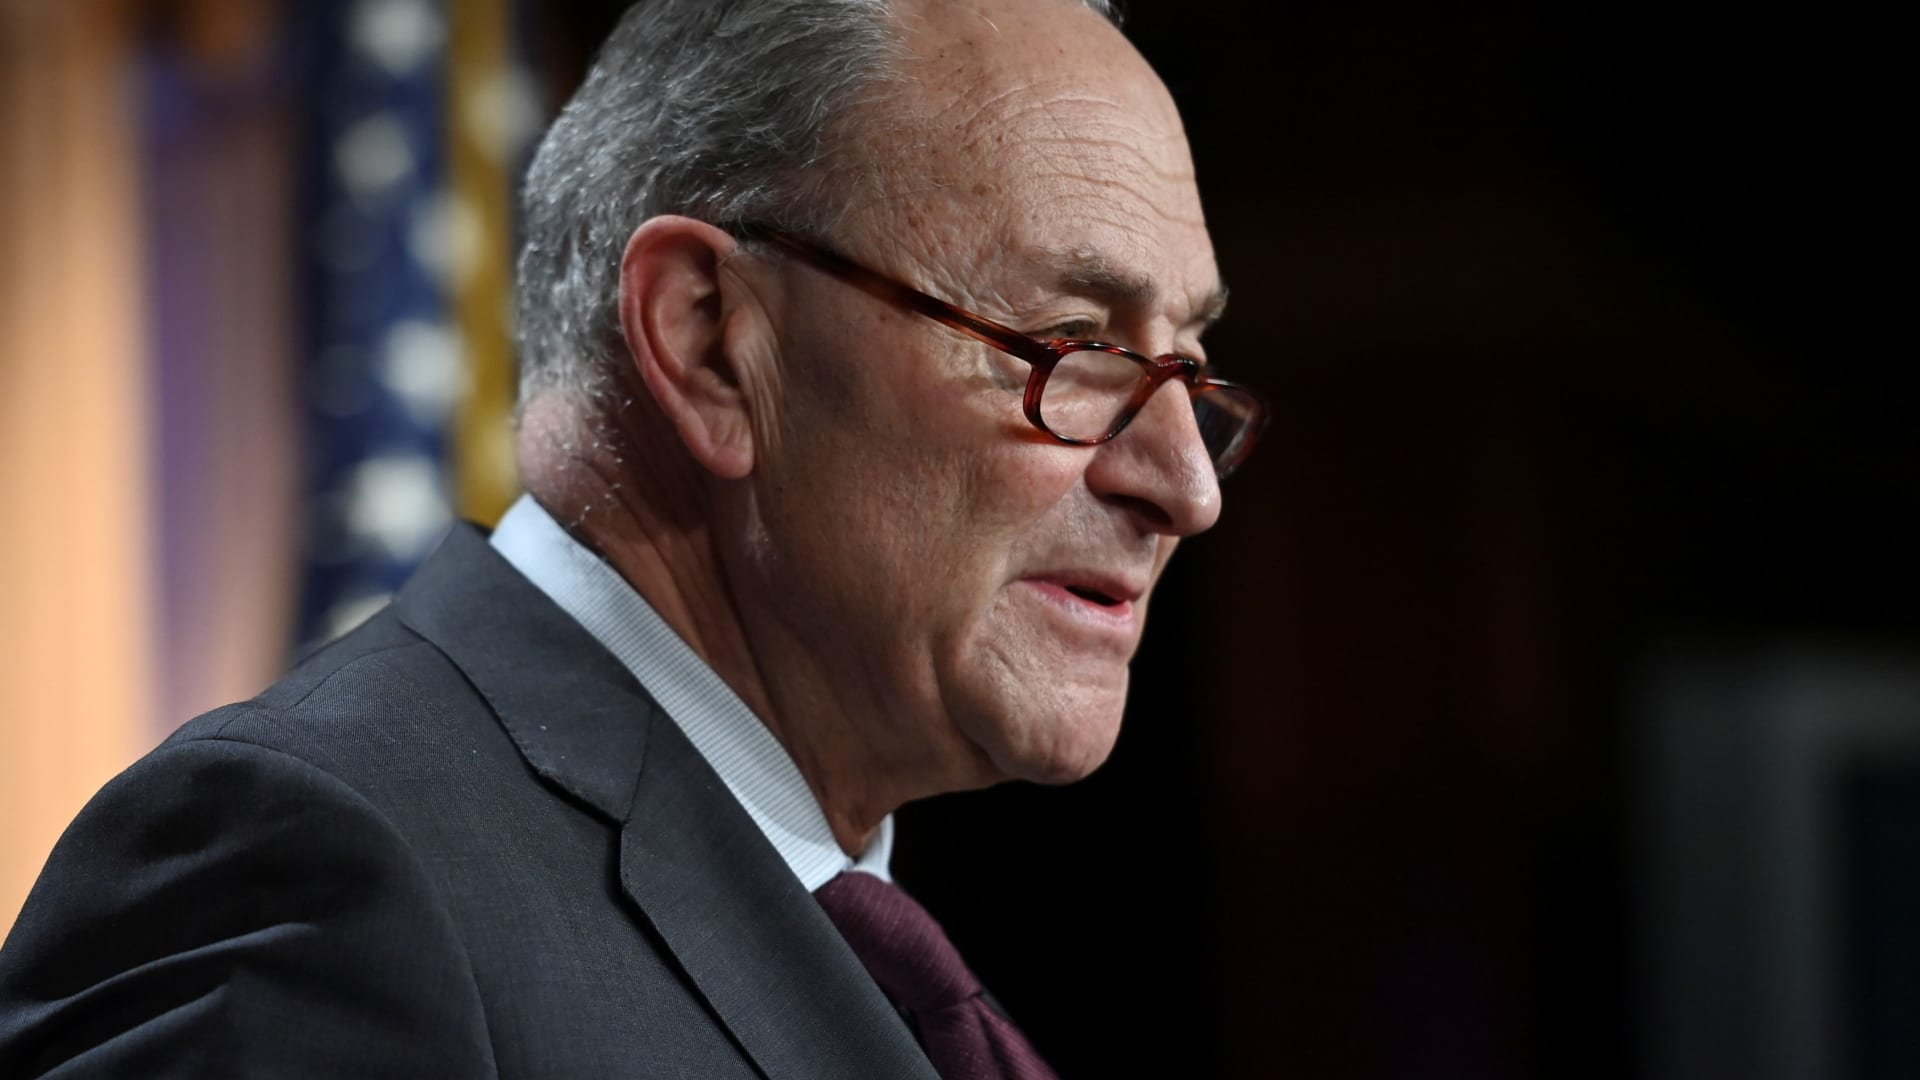 U.S. Senate Majority Leader Chuck Schumer, D-N.Y.